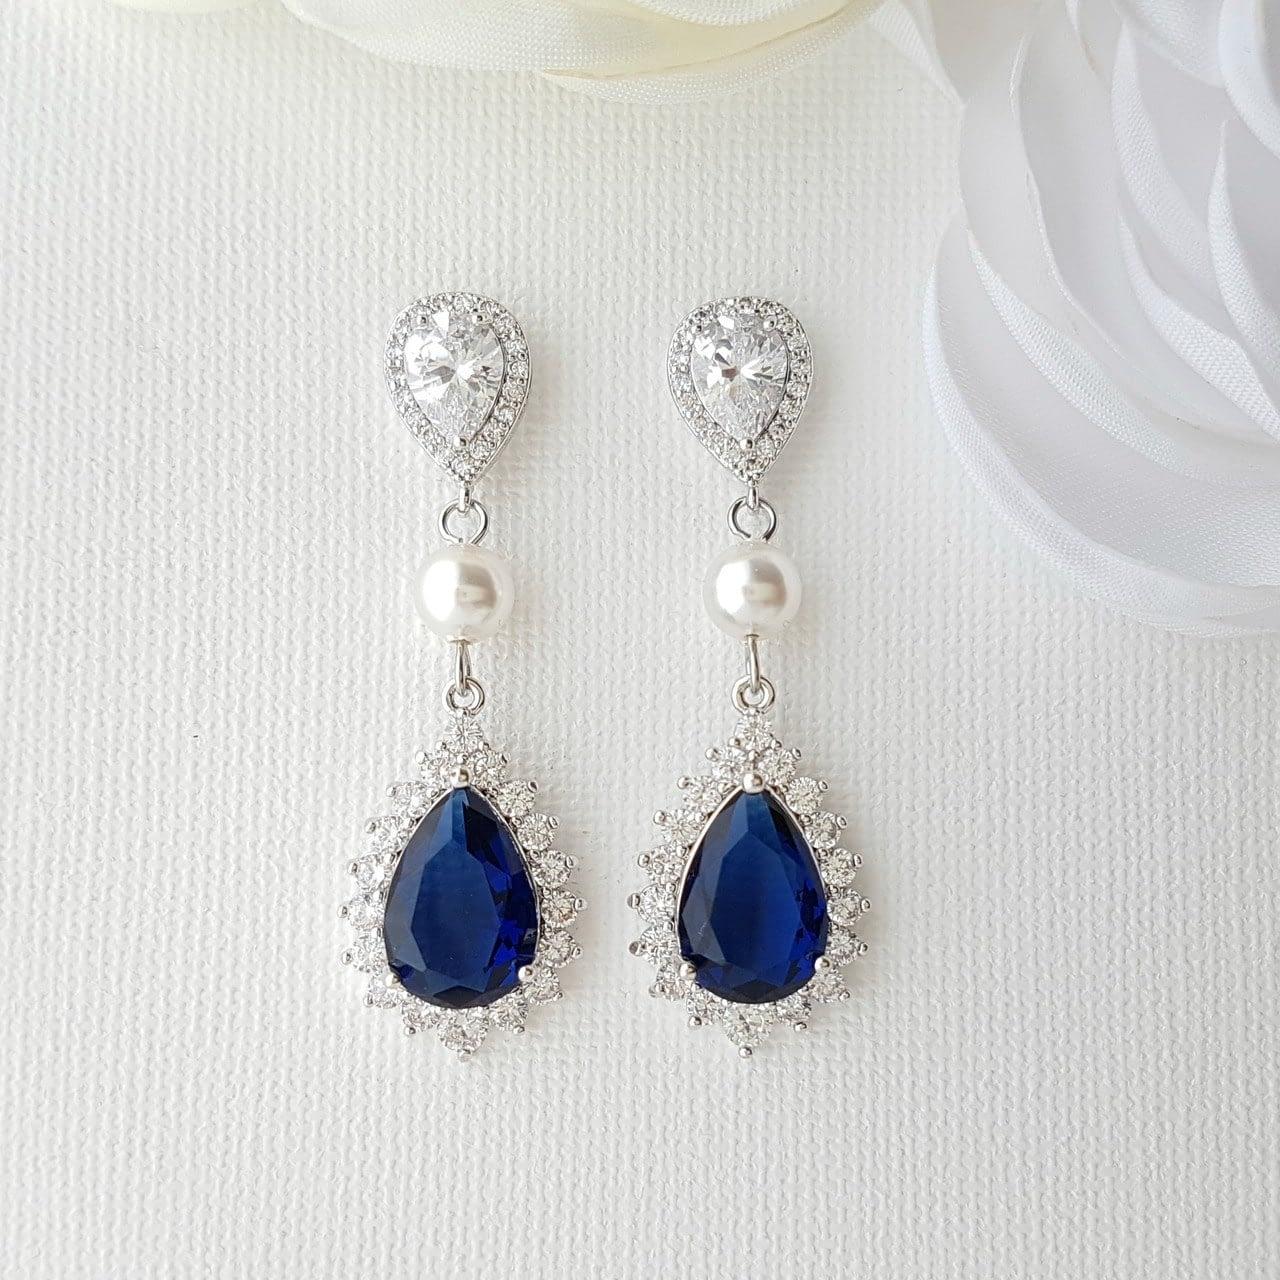 Something Blue Clip-On Earrings